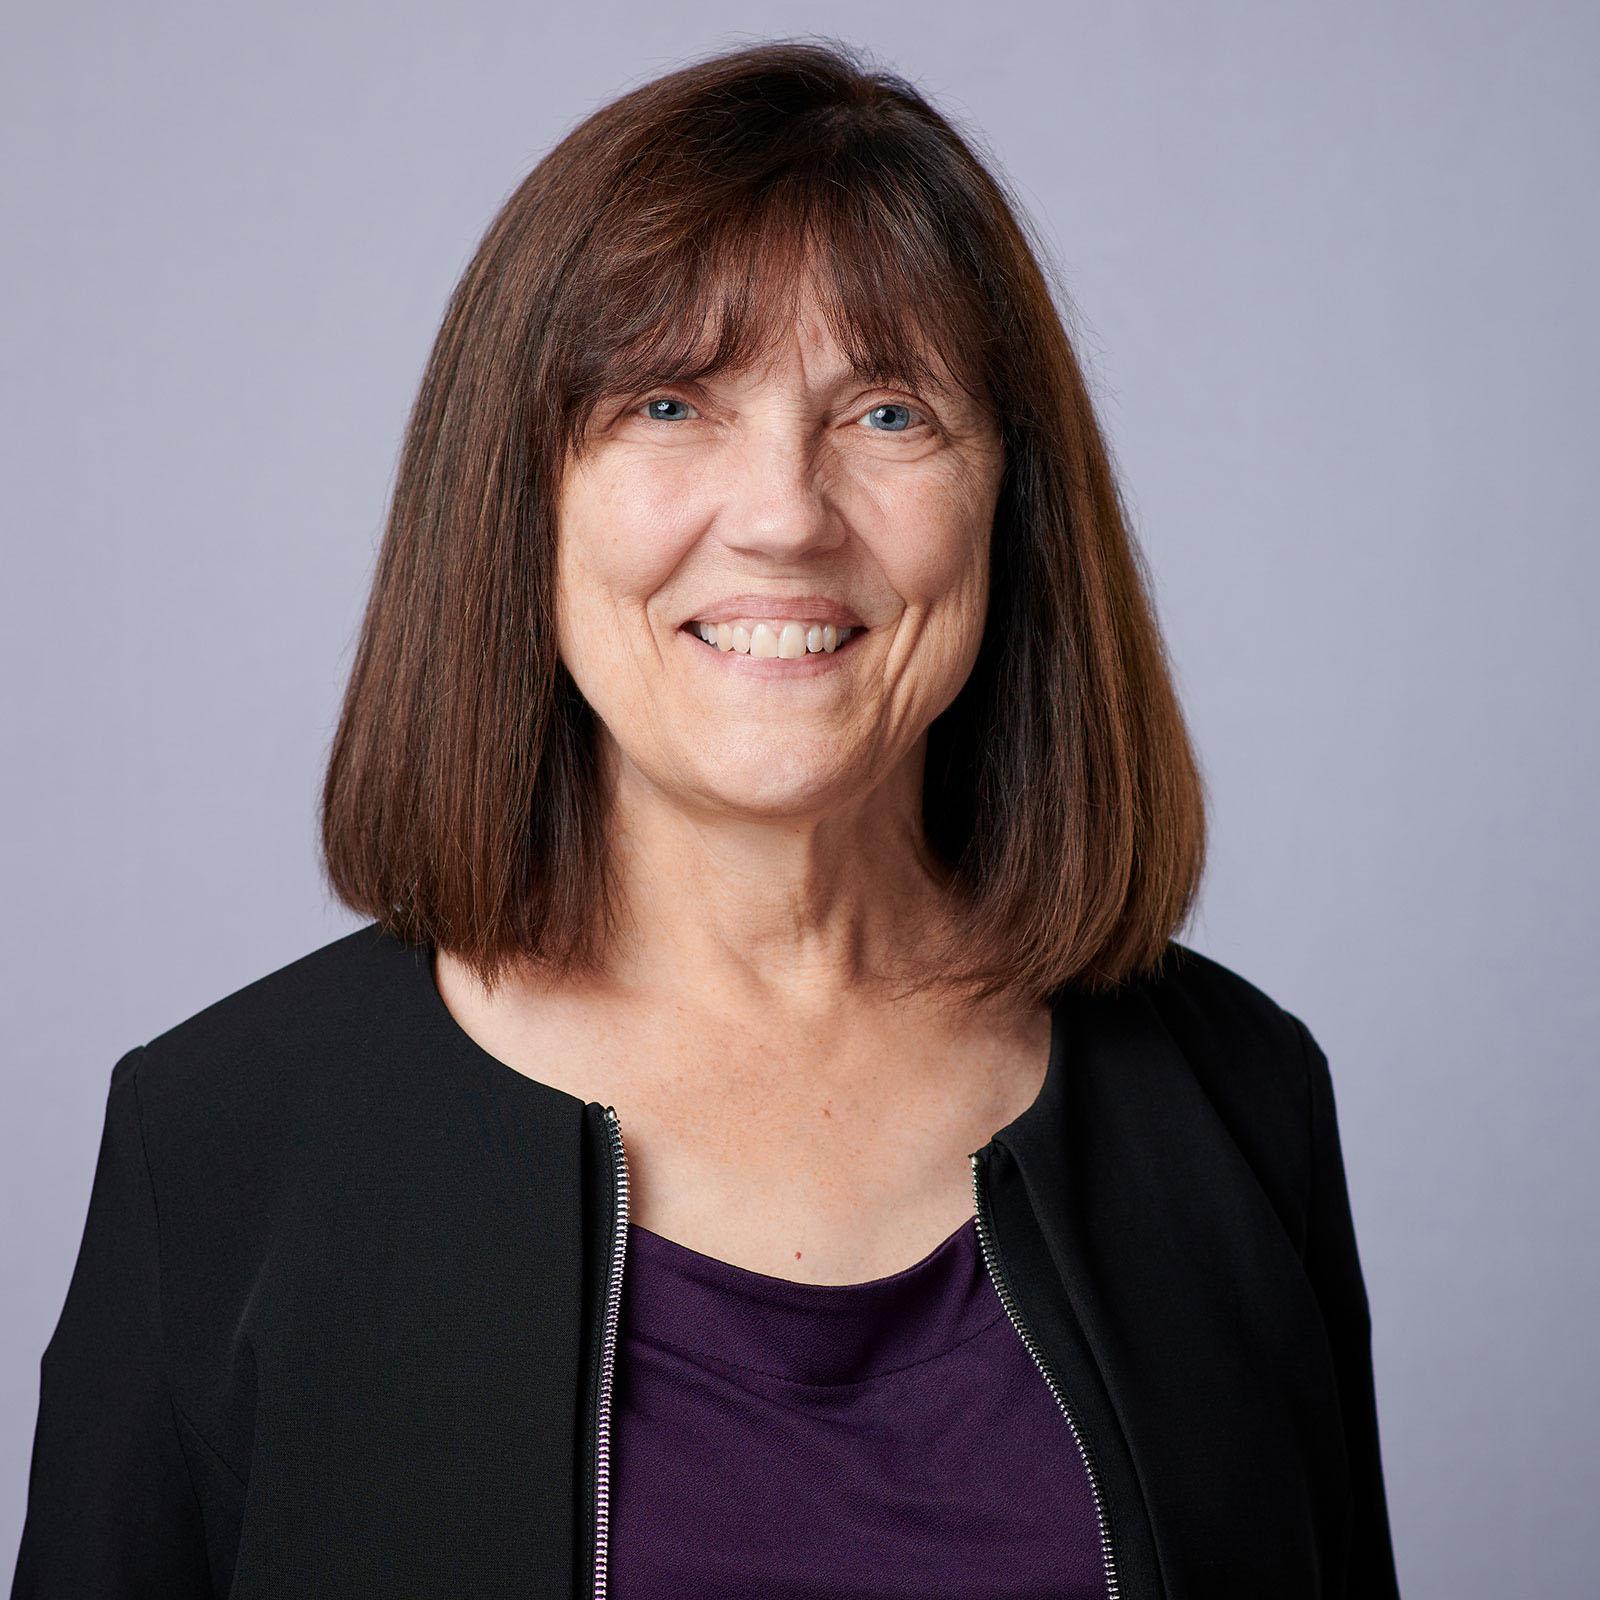 Denice McManigal